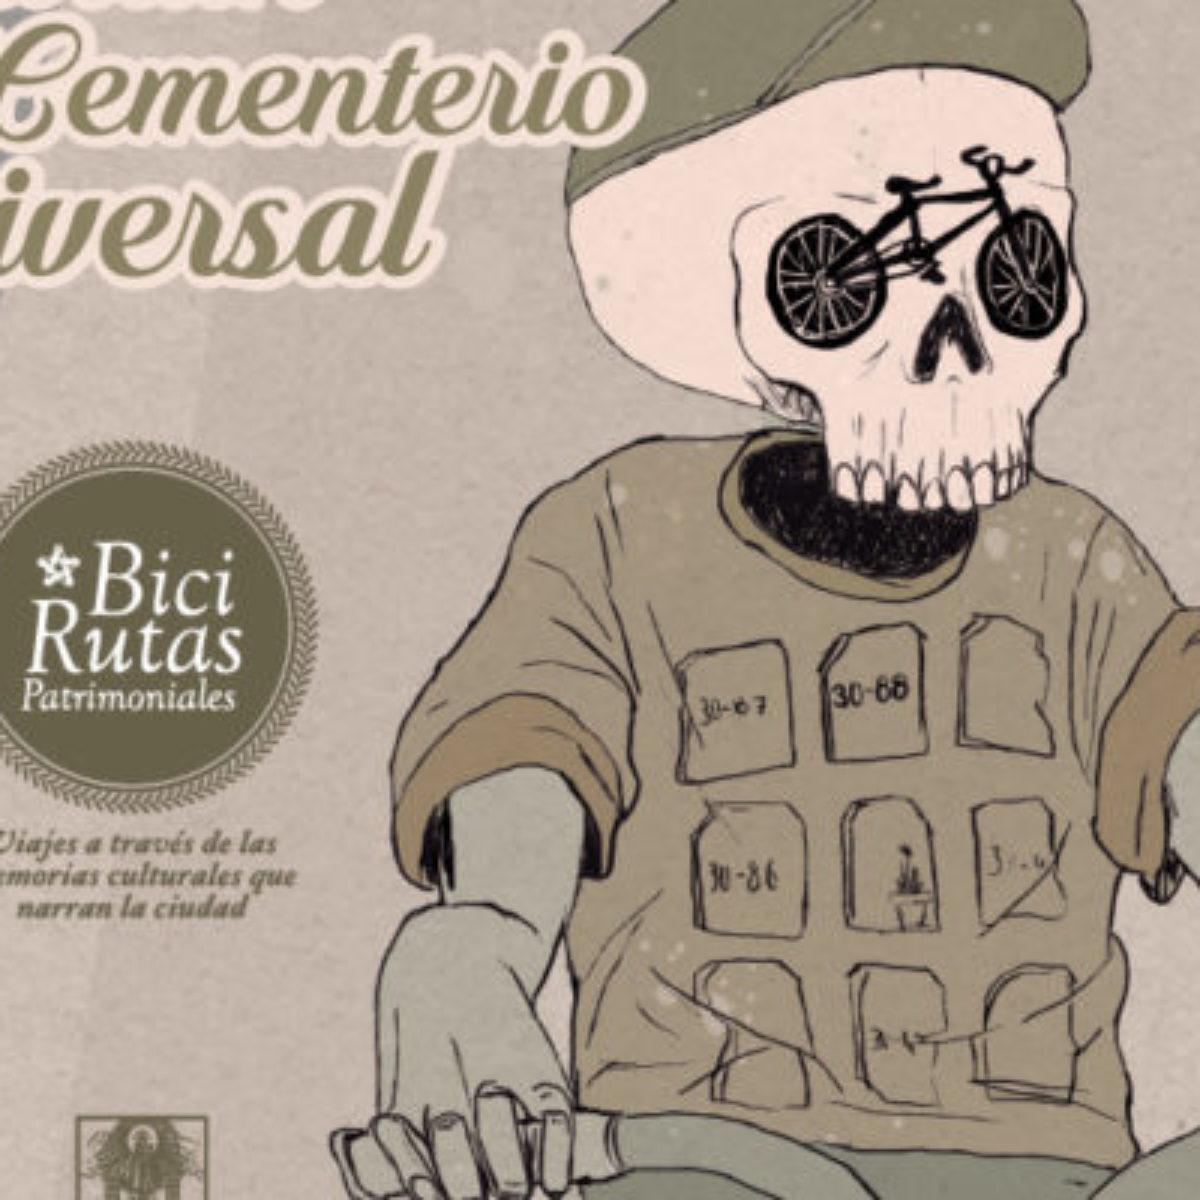 BiciRuta Patrimonial al Jardín Cementerio Universal